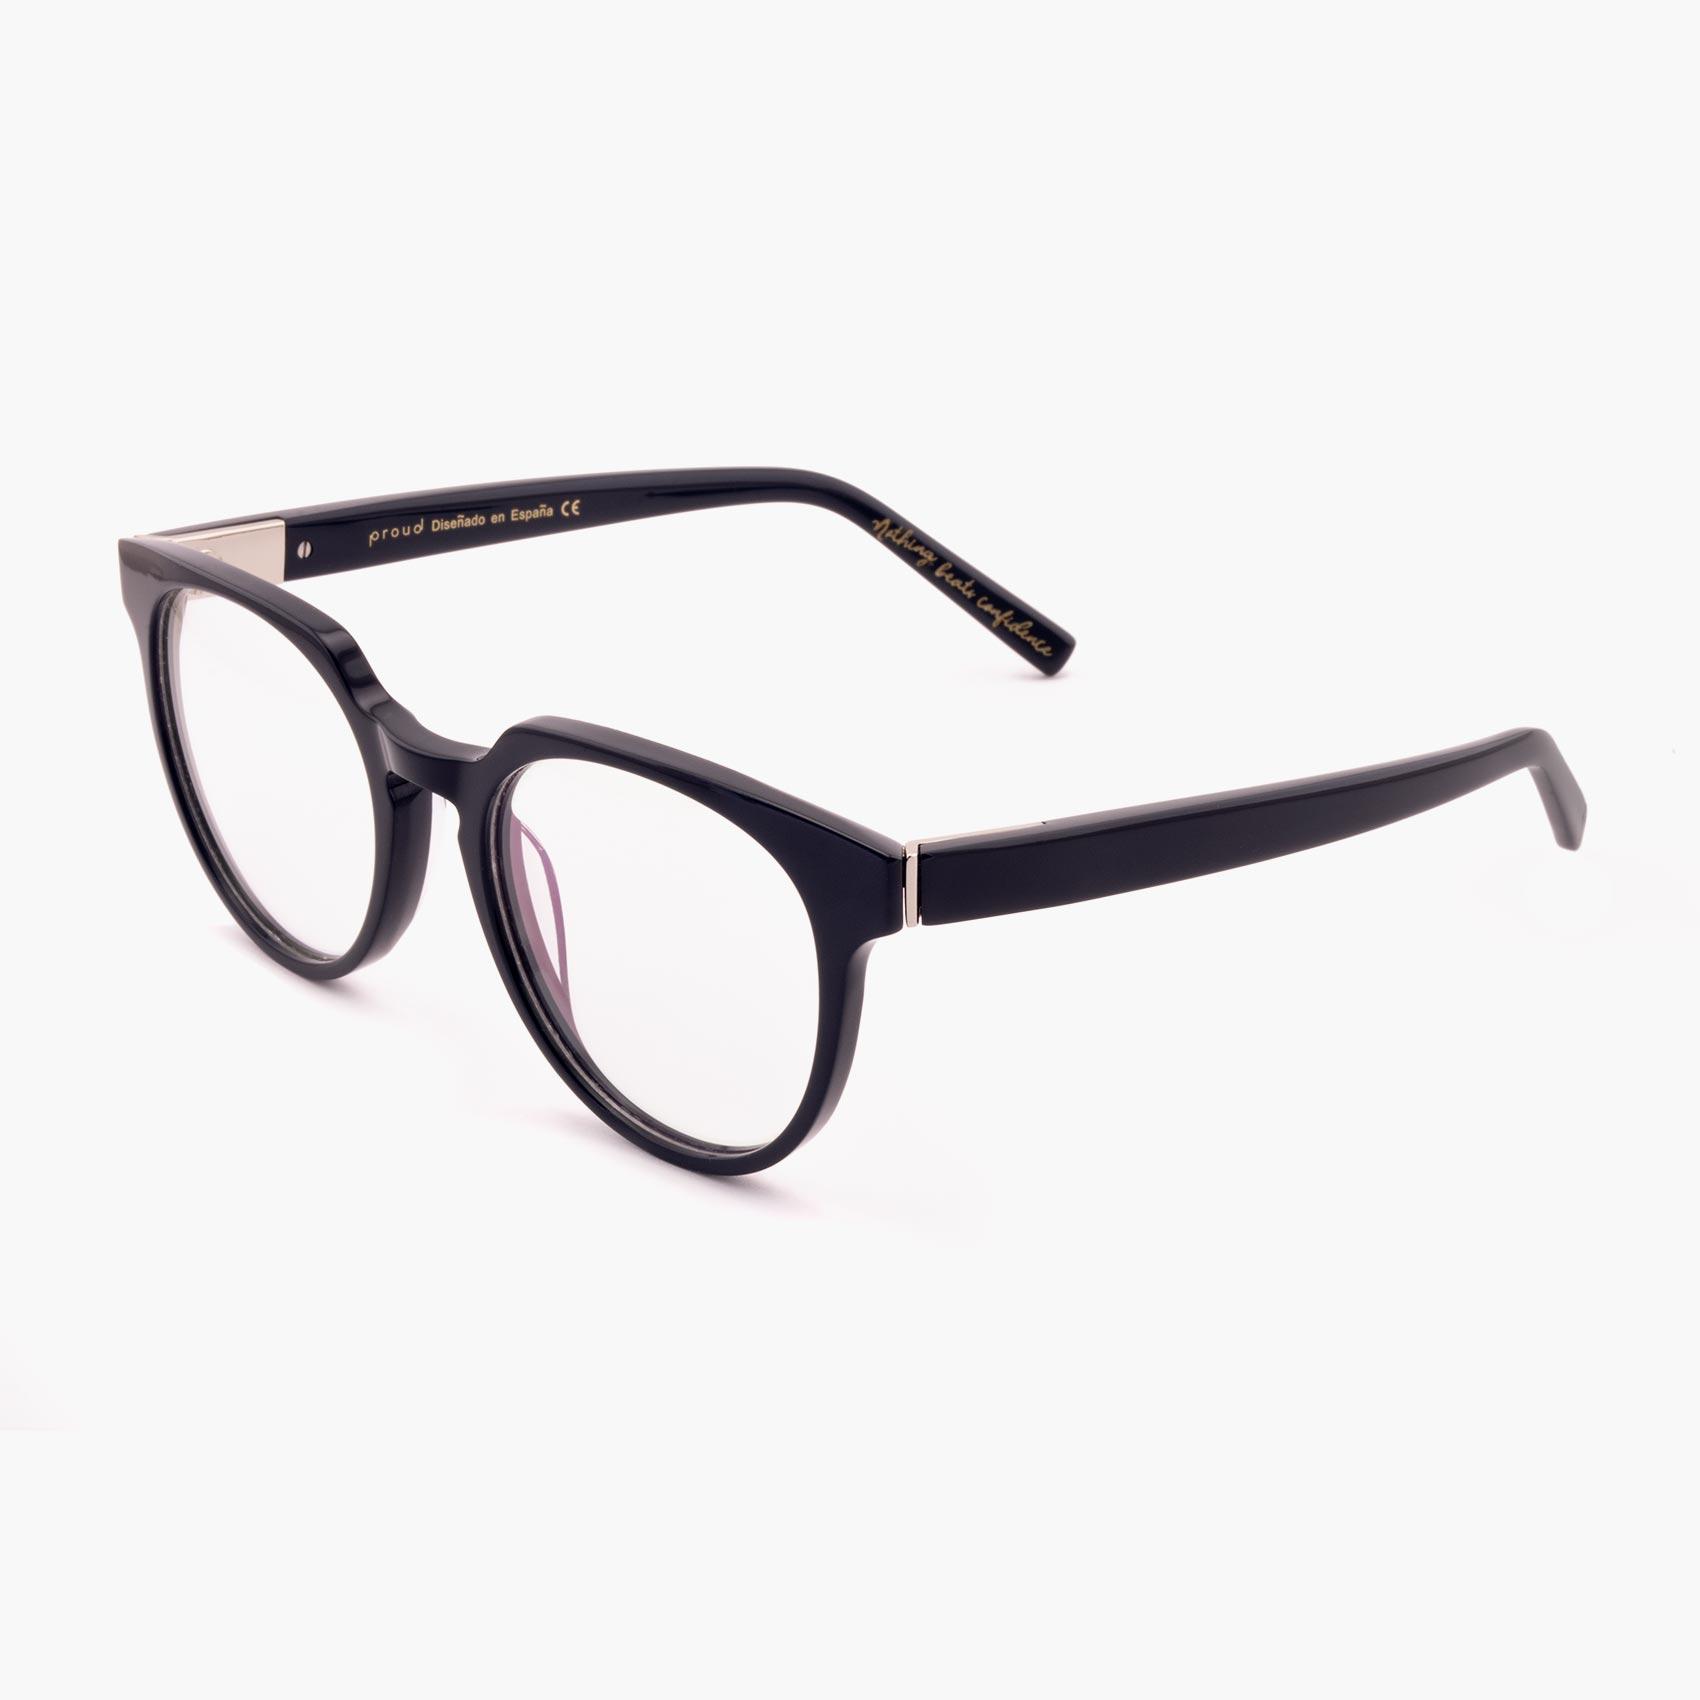 Proud eyewear Benigni C3 P tendencia gafas graduadas azul oscuro